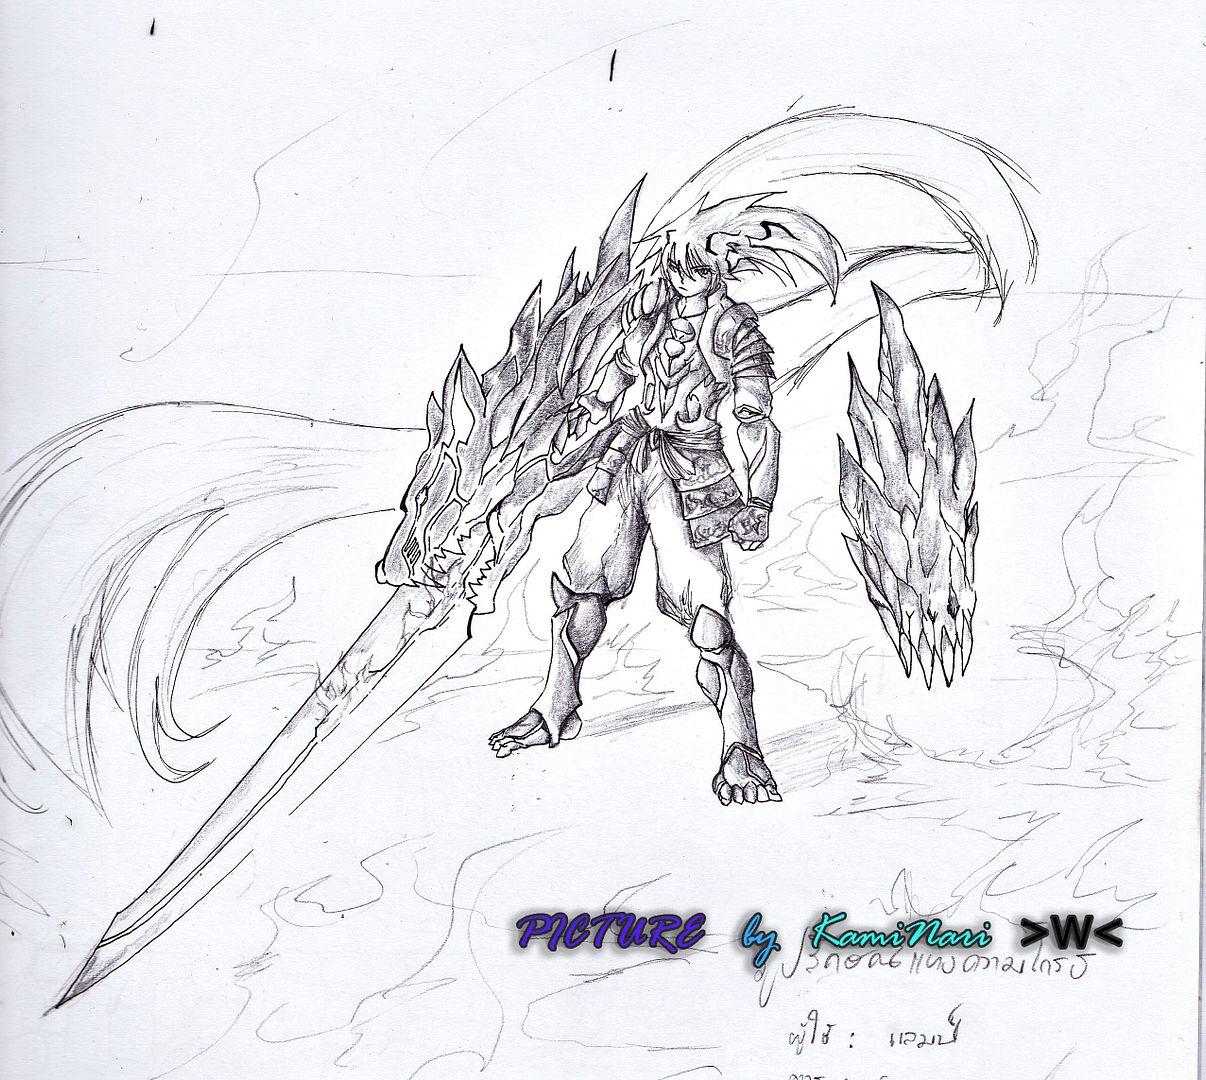 kaminari  กับ  กระทู้มั่วซั่ว - Page 6 Lamp_0003_zps74dbbcd1